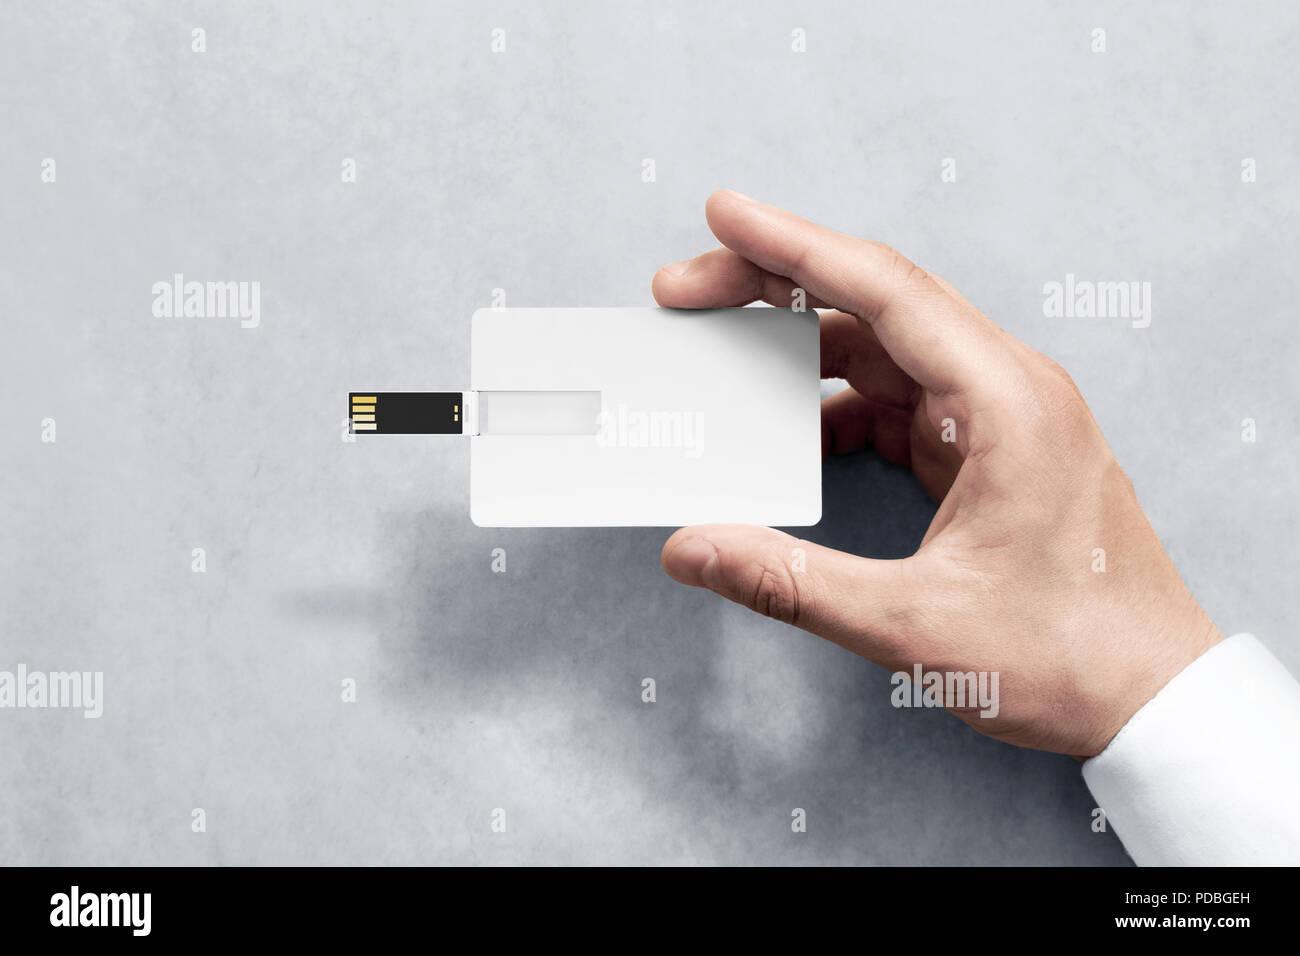 Blank white plastic wafer usb card design mockup holding hand. Visiting flash drive namecard mock up. Call-card disk souvenir presentation. Flat credit stick adapter. Bussiness favor in mans arm - Stock Image